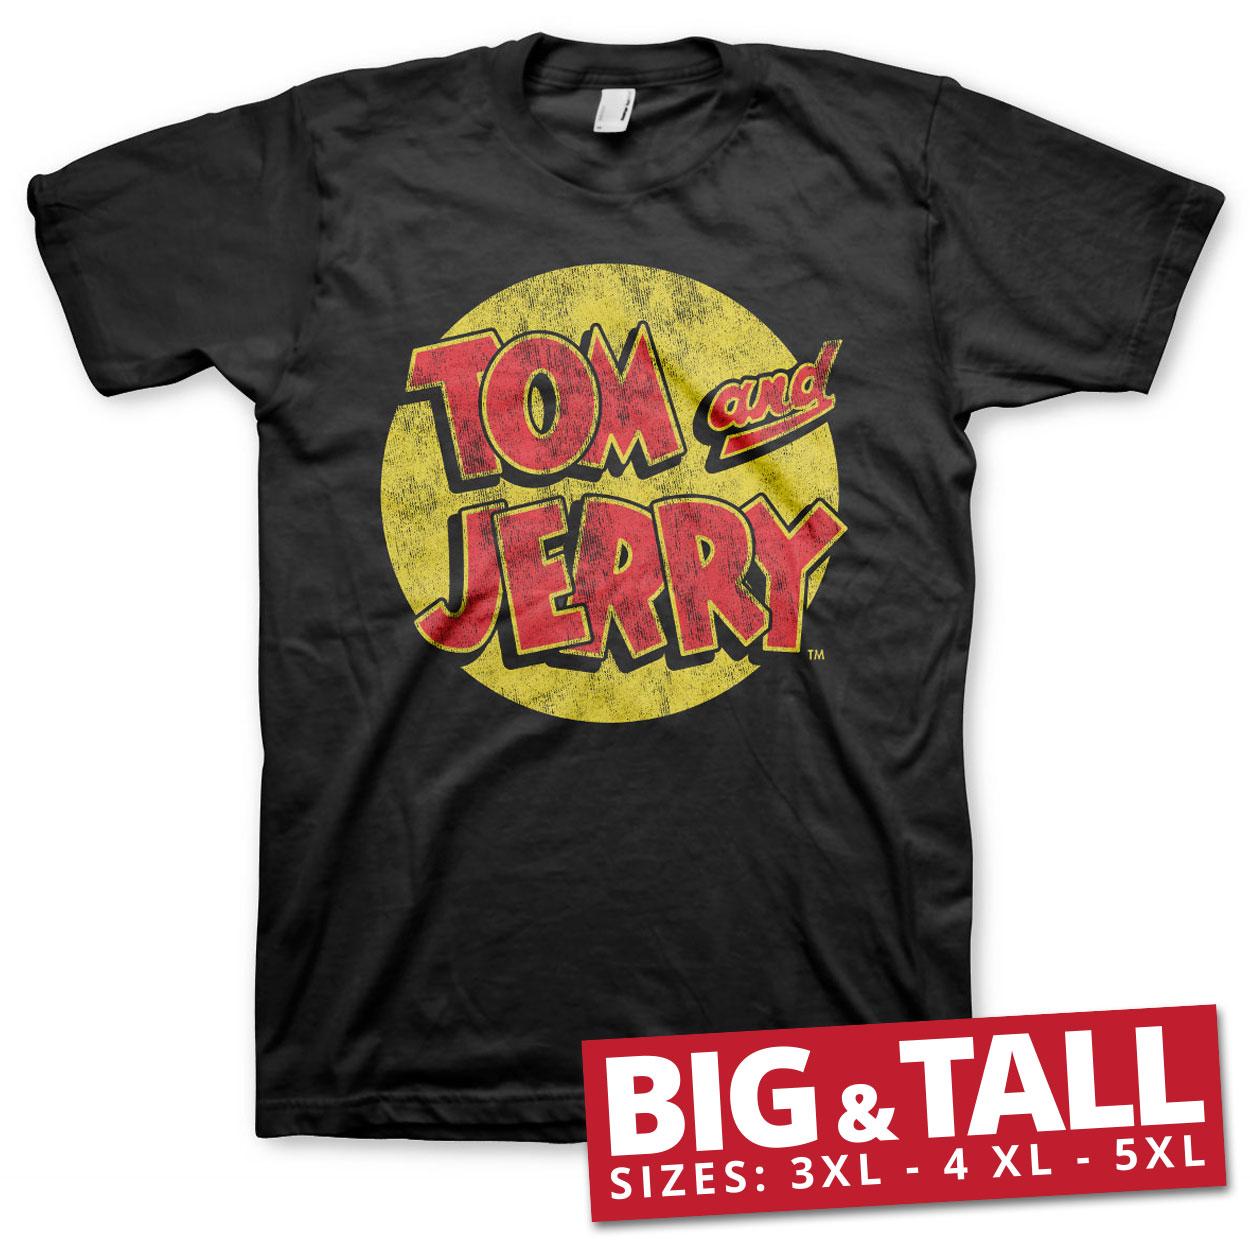 Tom & Jerry Washed Logo Big & Tall T-Shirt